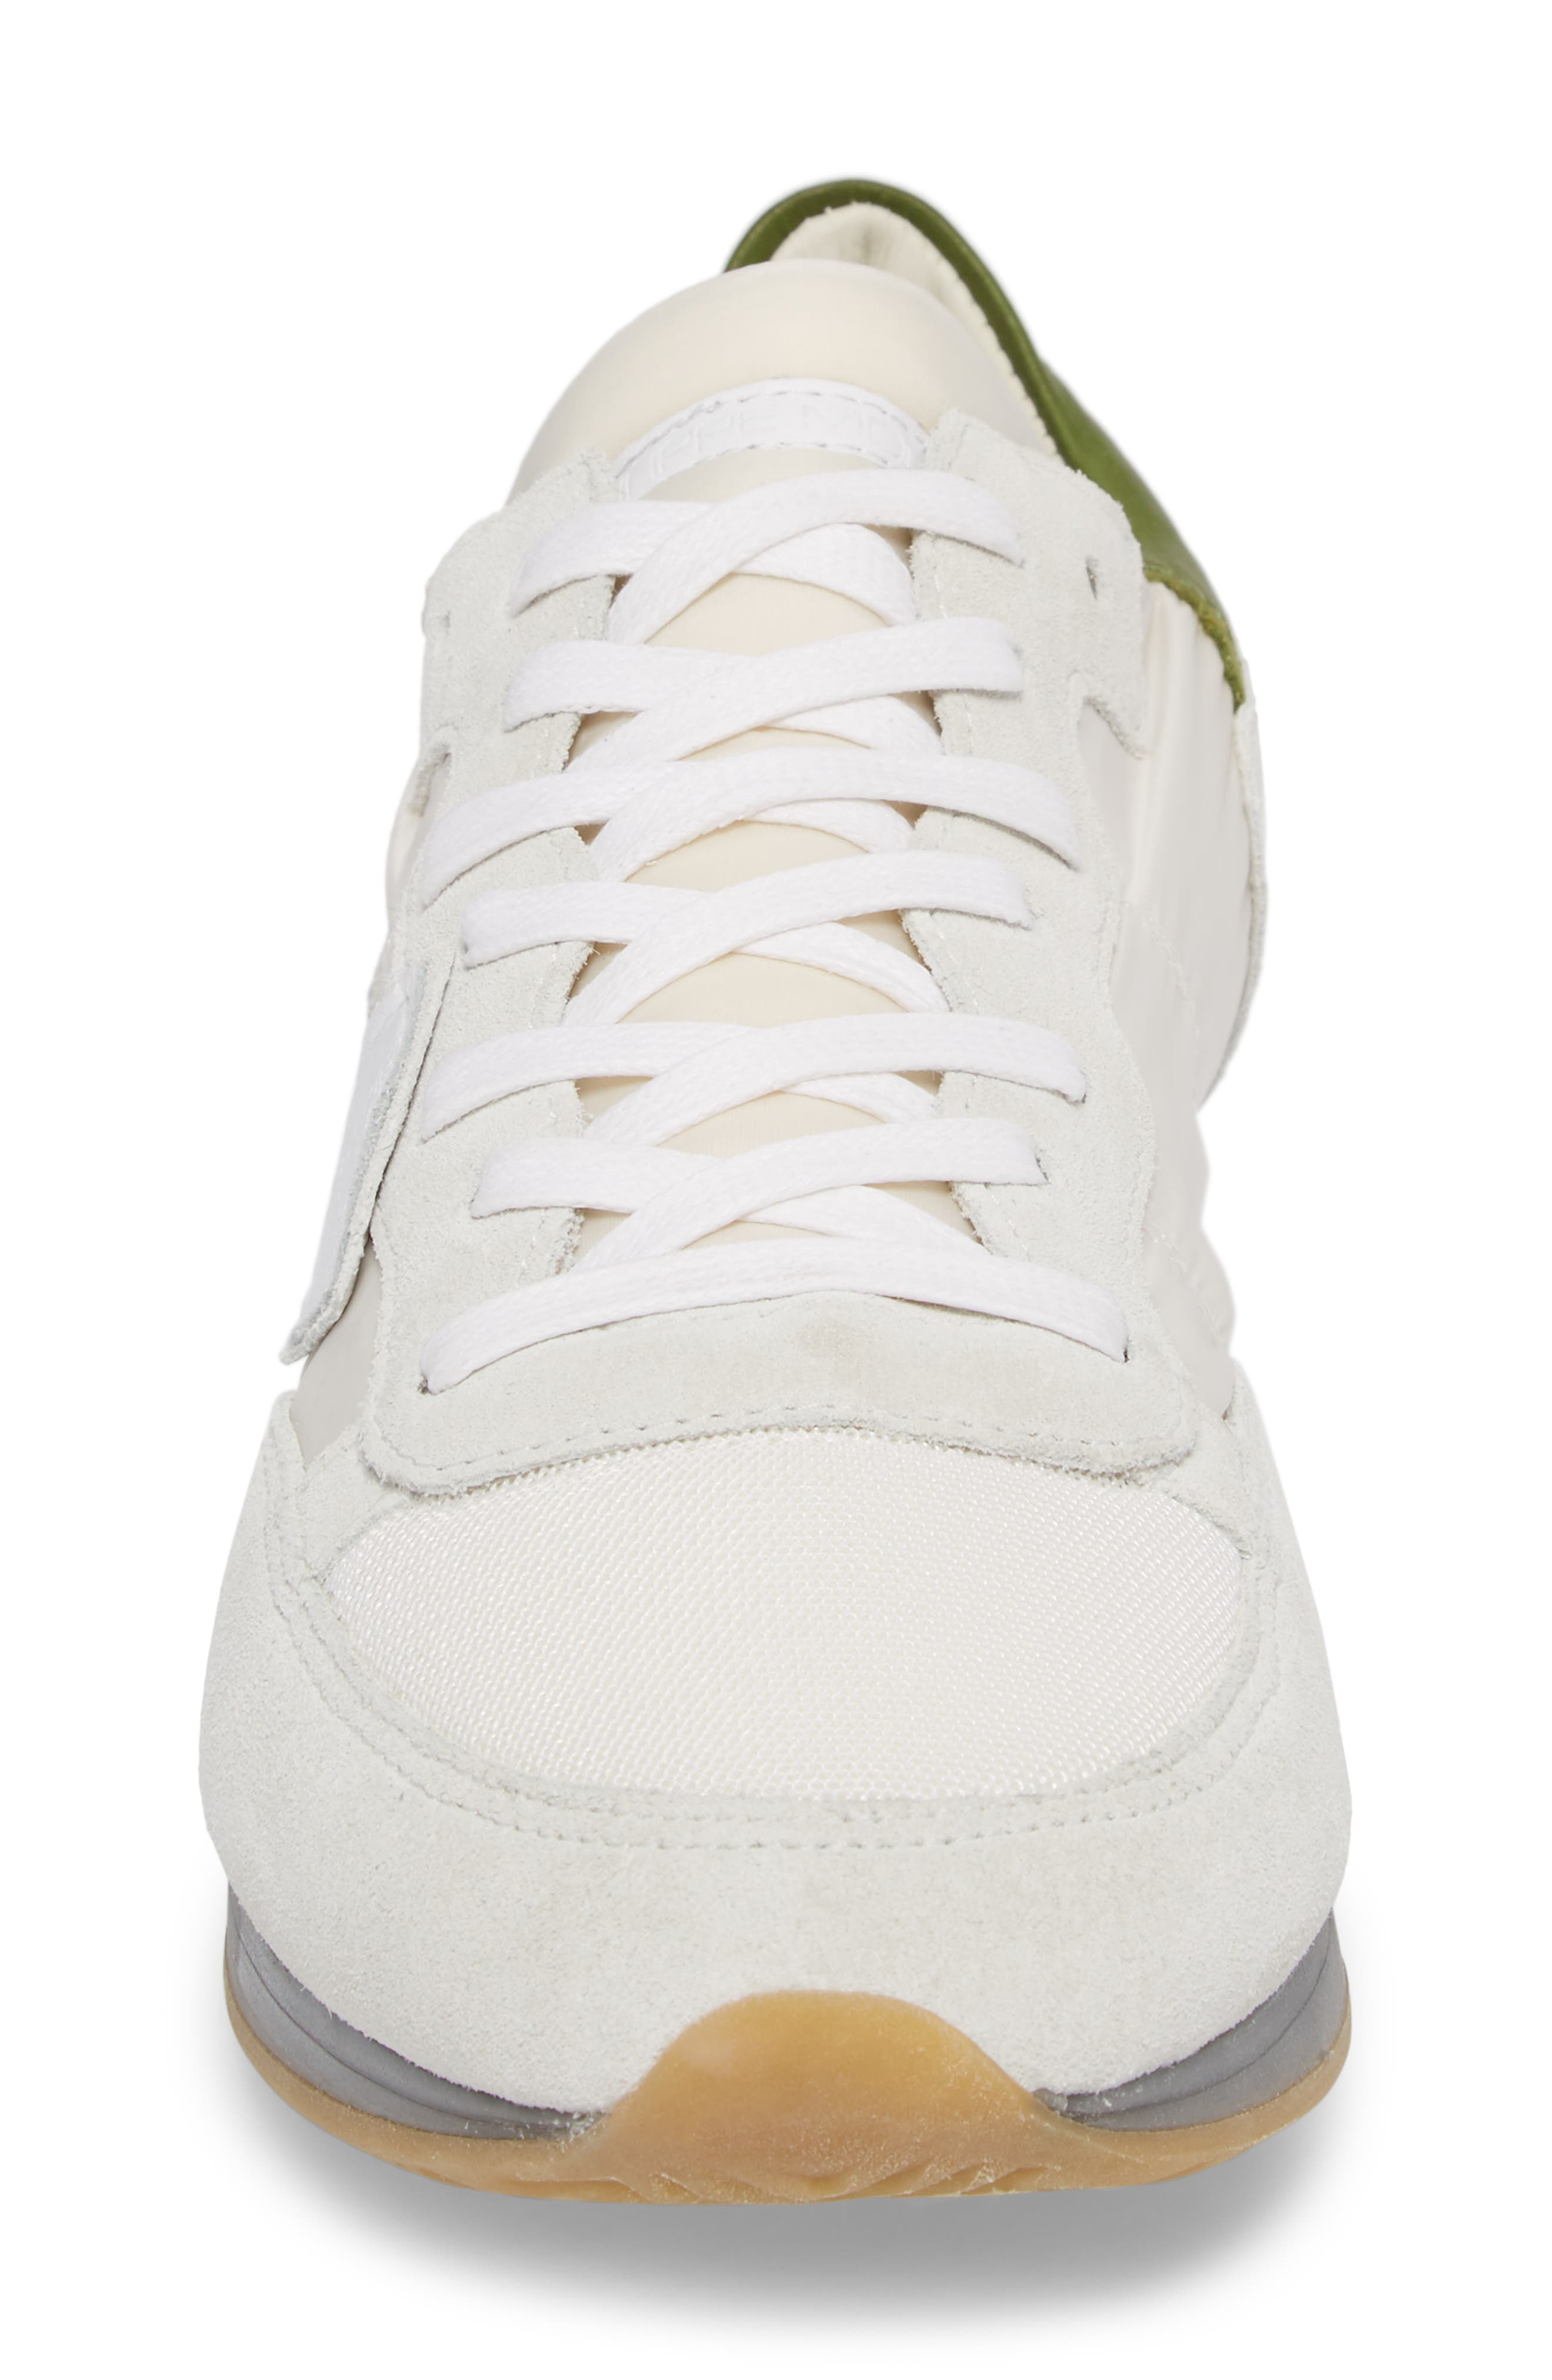 Tropez Sneaker,                             Alternate thumbnail 4, color,                             120